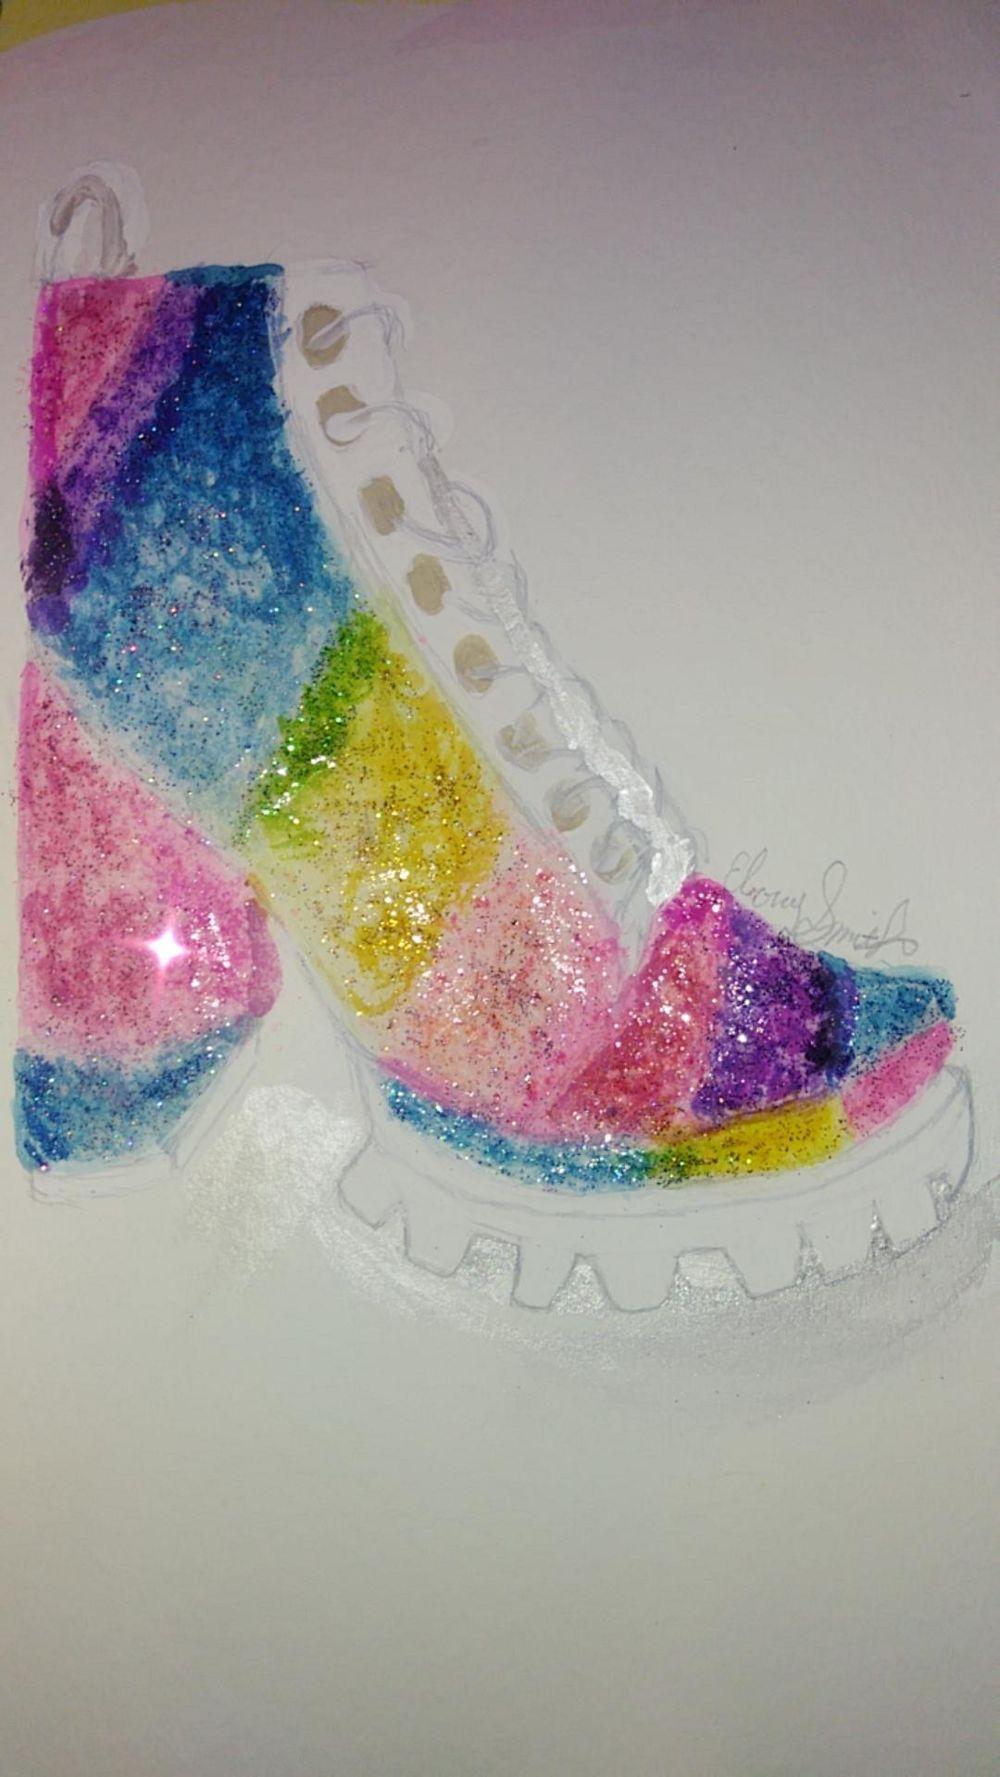 Ebony_Smith_Glitter_Boot - image 1 - student project